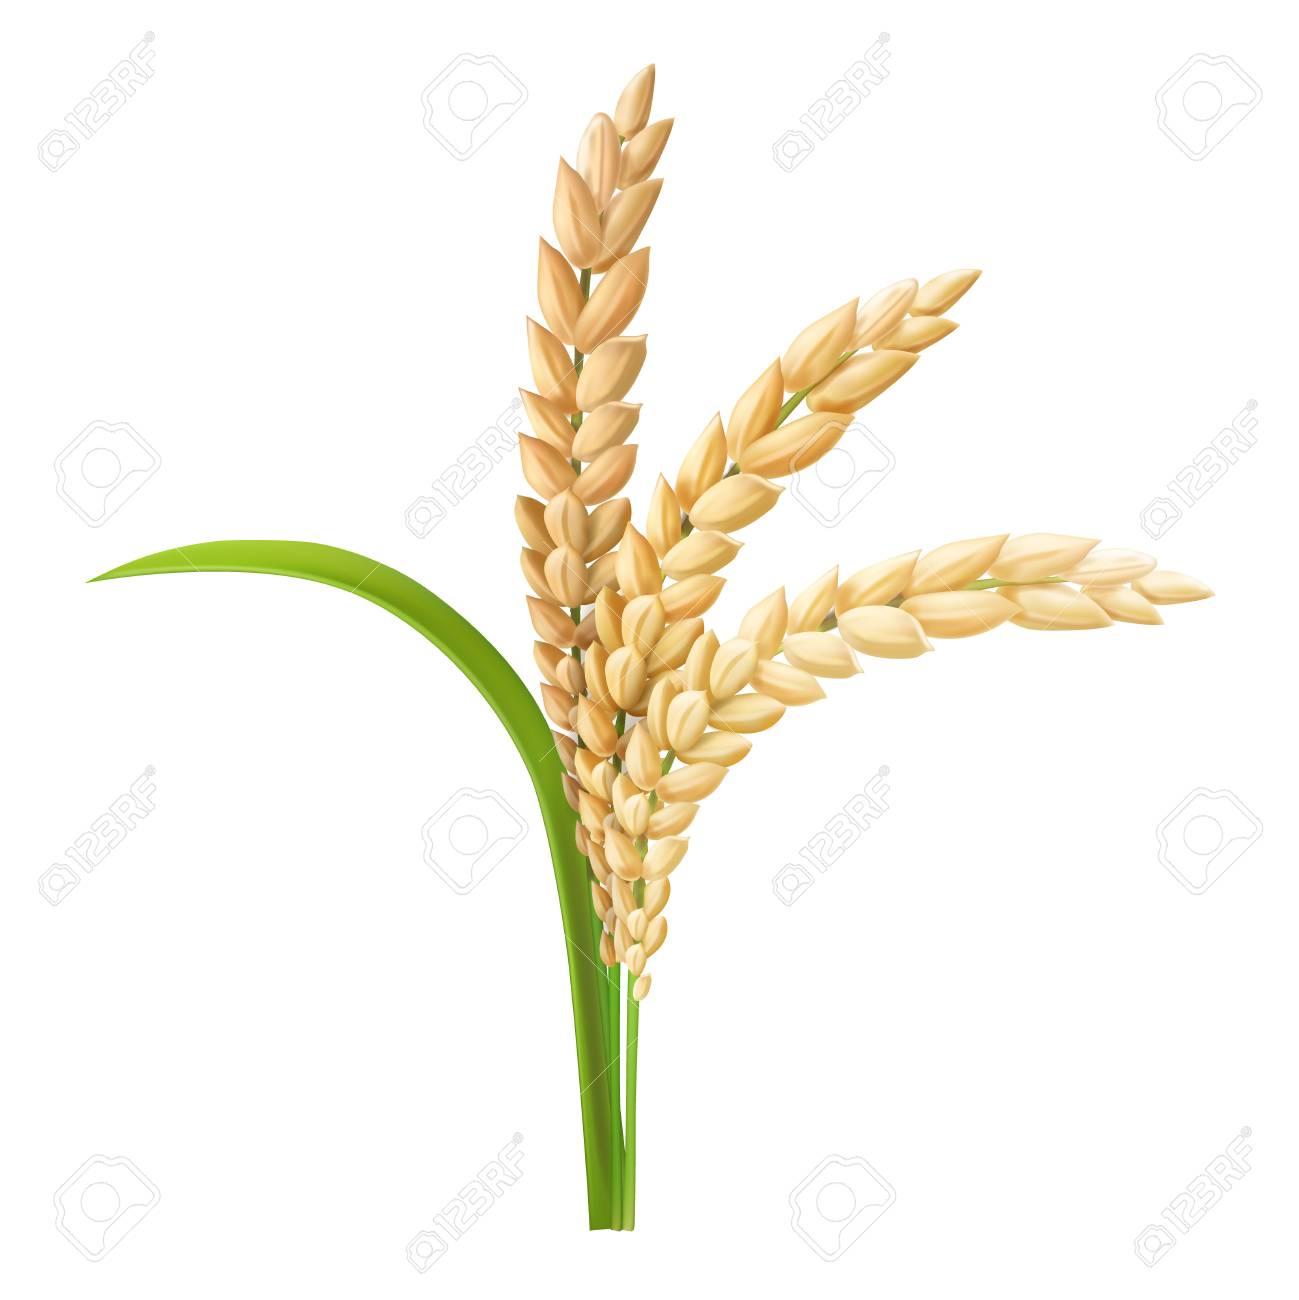 Rice ear realistic vector illustration - 90606509